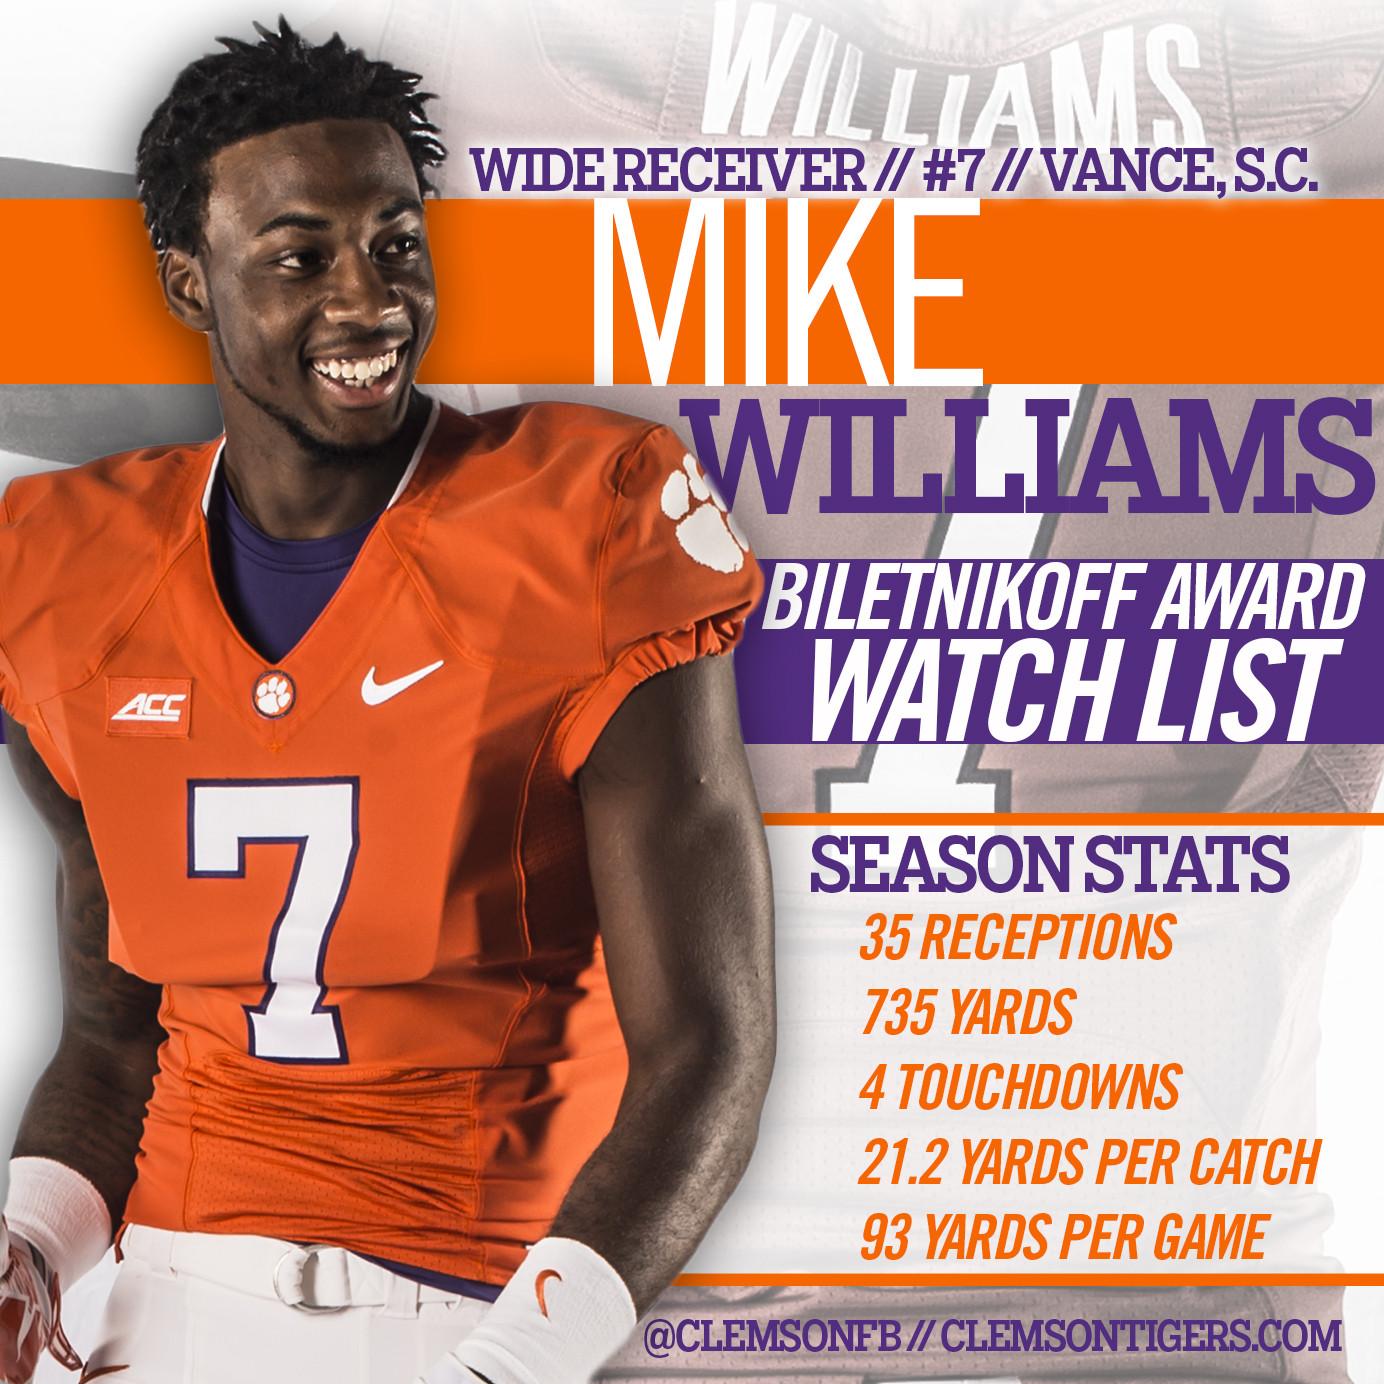 Williams Added to Biletnikoff List